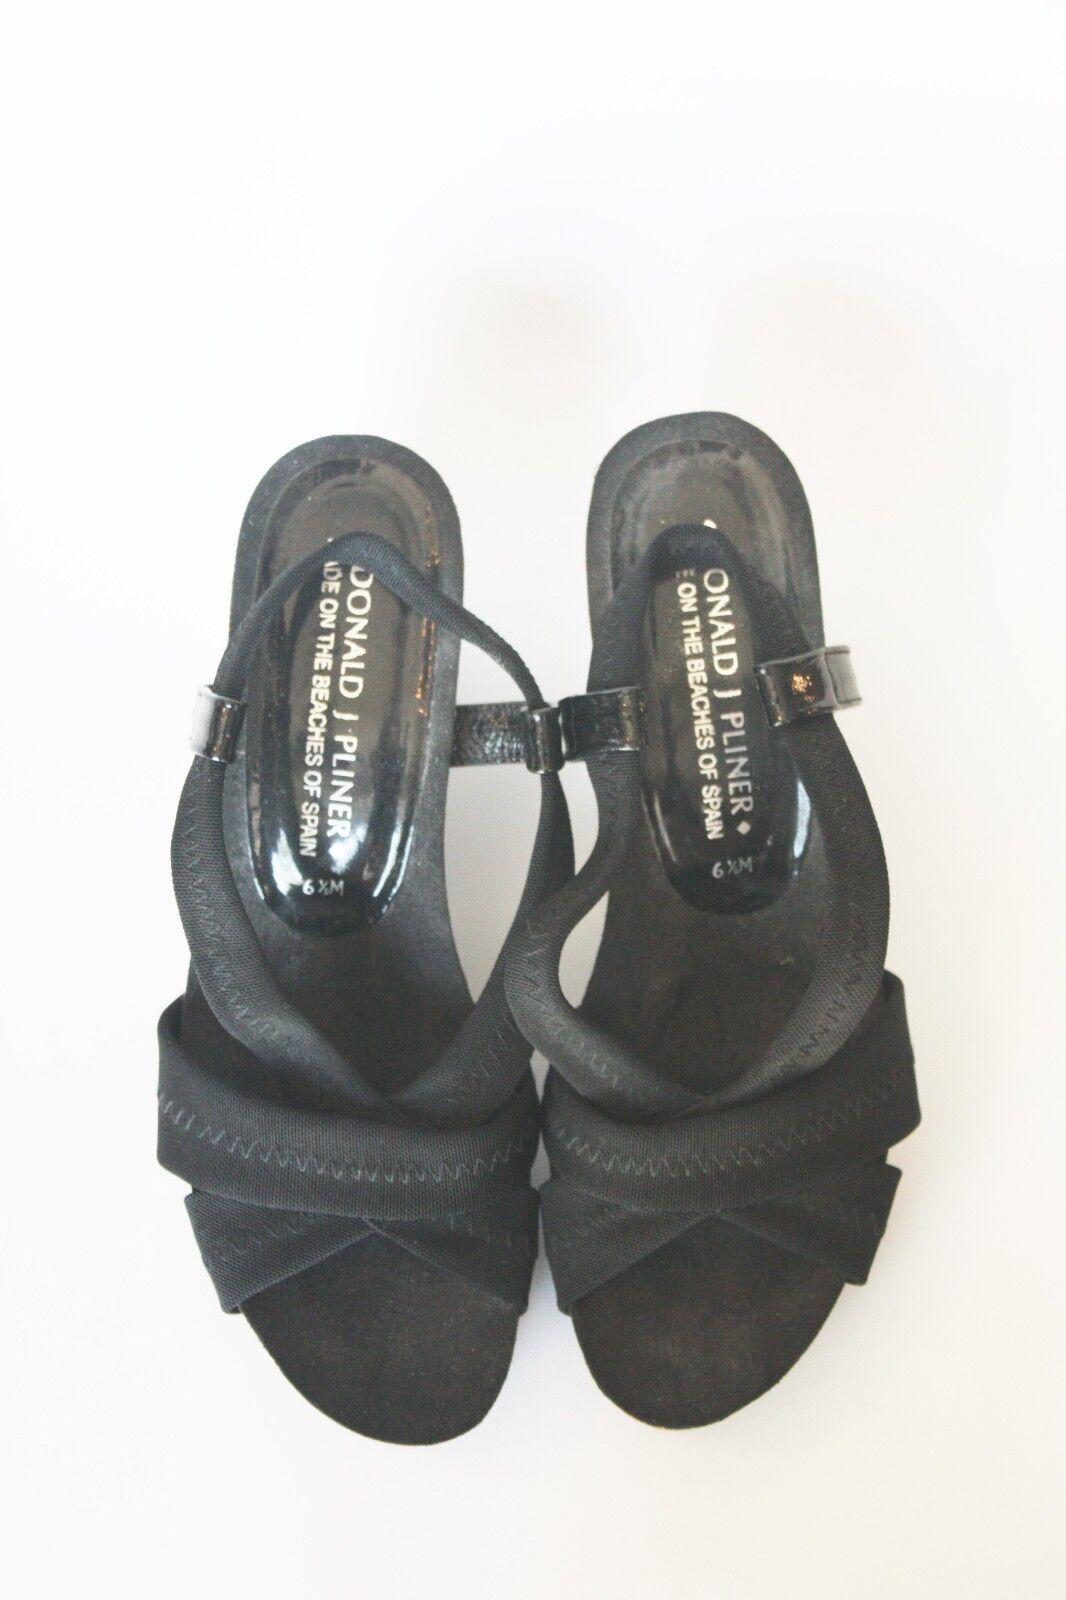 DONALD J PILNER JEMM STRETCH WEDGE SANDALS 6.5  178 Shoes Platfrom Cork Heels Shoes 178 6fabcb